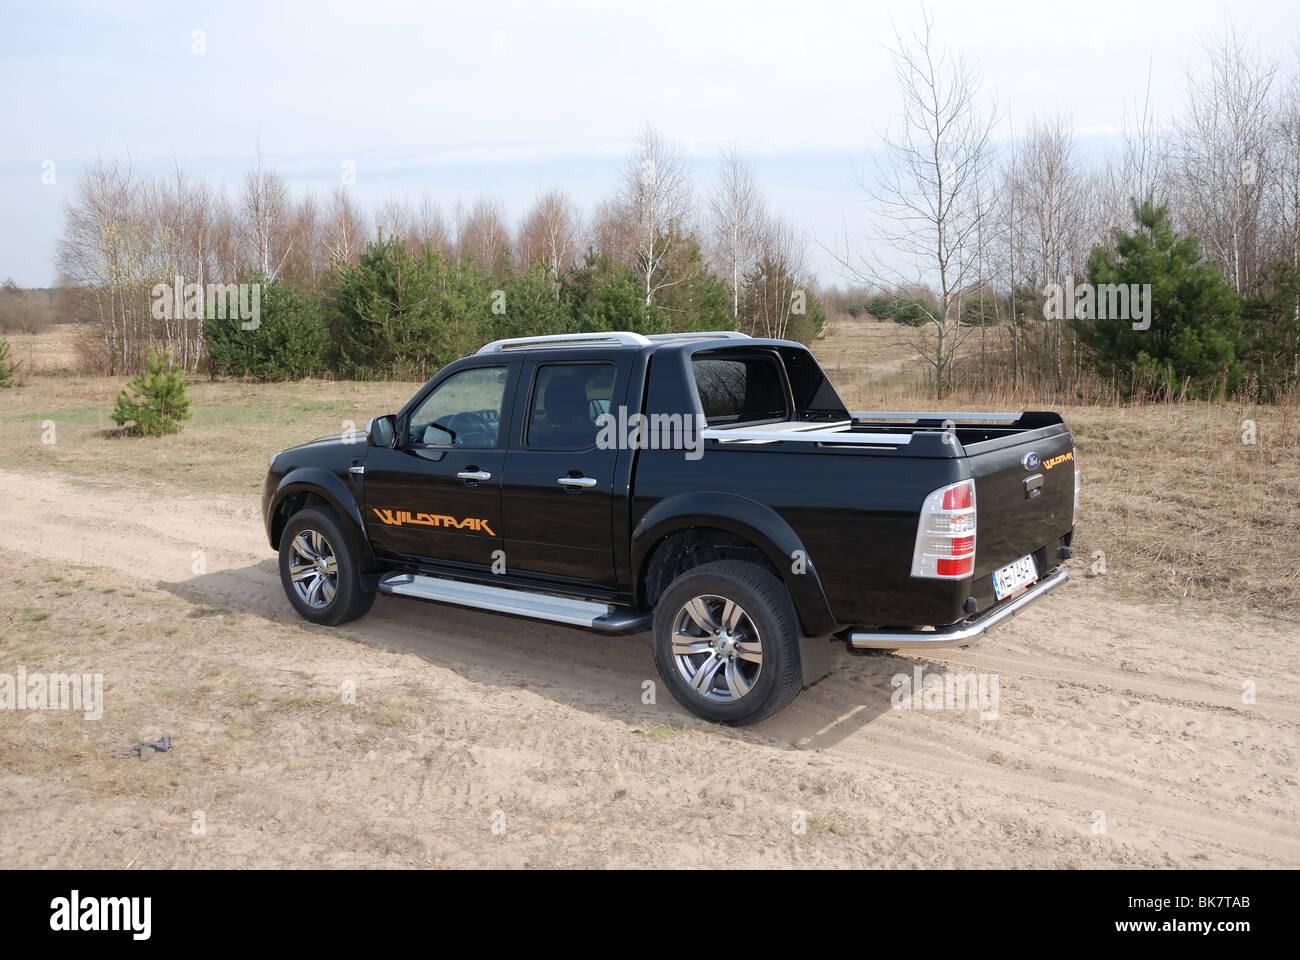 ford ranger 3 0 tdci wildtrak 4x4 my 2010 black metallic double stock photo 29061603 alamy. Black Bedroom Furniture Sets. Home Design Ideas